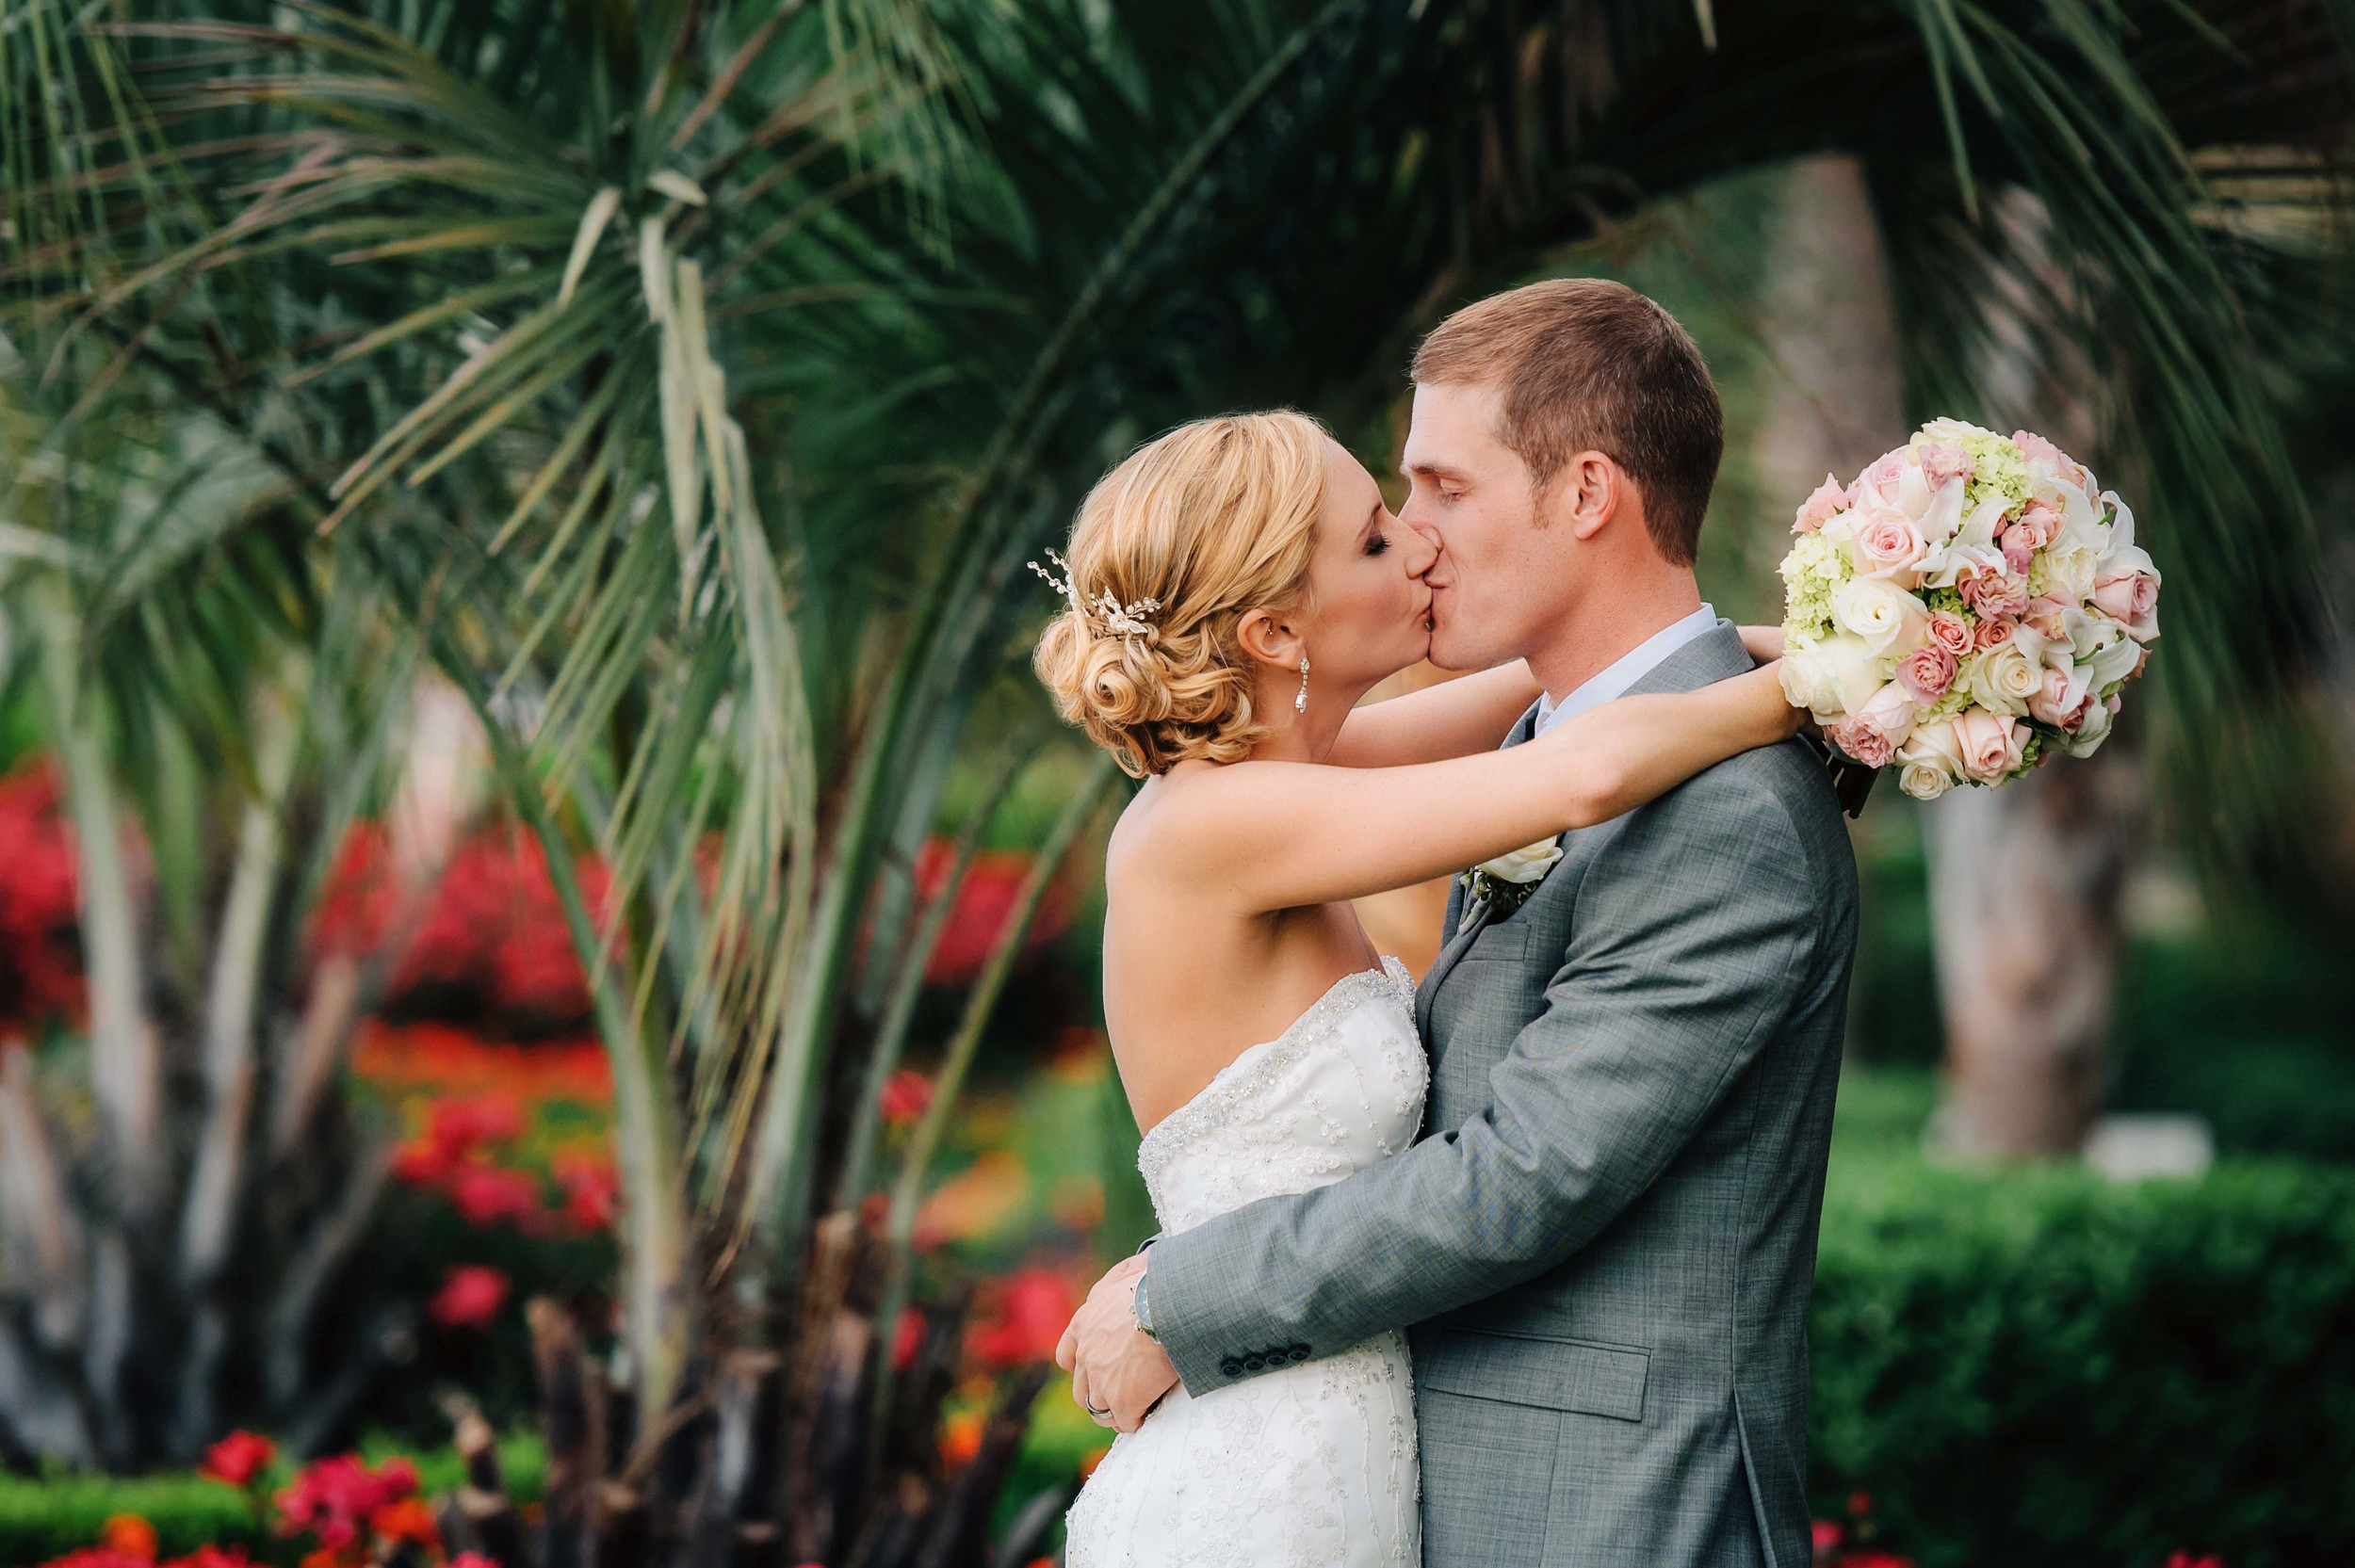 virginia-beach-wedding-photographer-oceanaire-wedding-photography-norfolk-wedding-photographers-porstmouth-wedding-photographer-melissa-bliss-photography